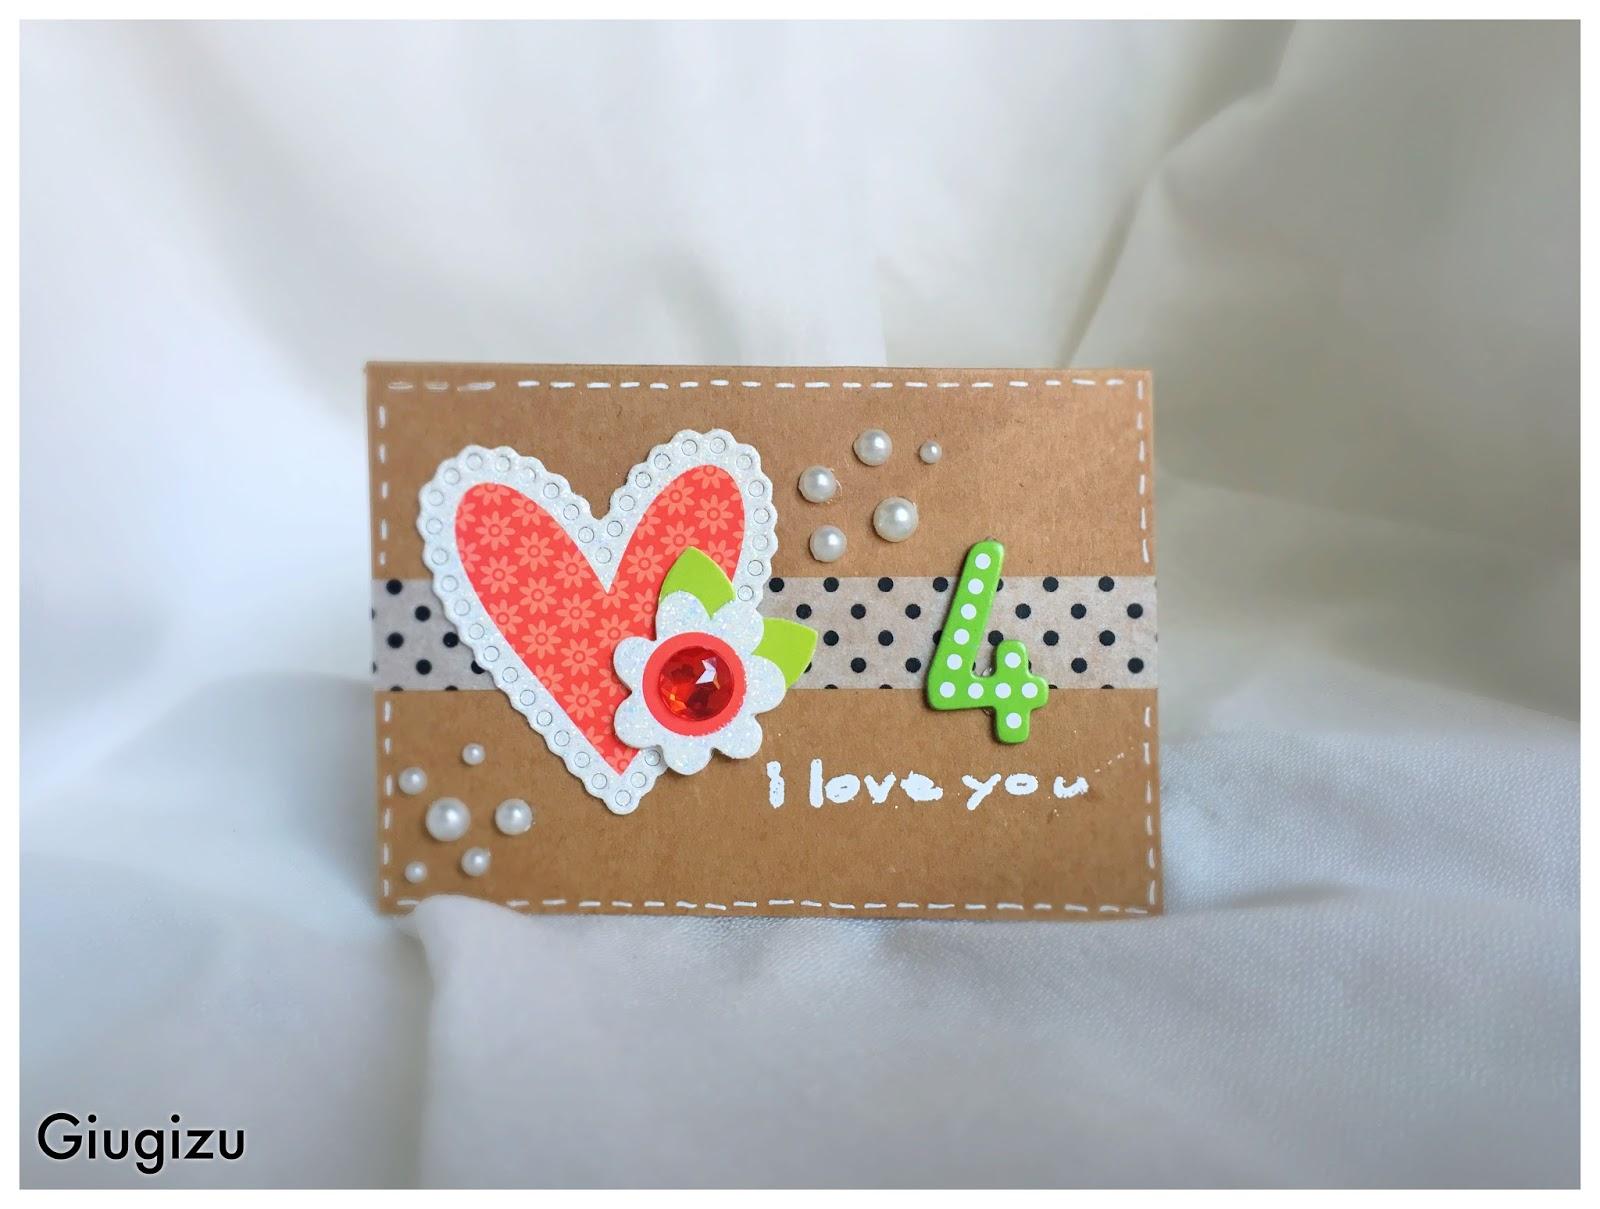 Connu Giugizu's corner: Handmade wedding anniversary card - Biglietto  KE12